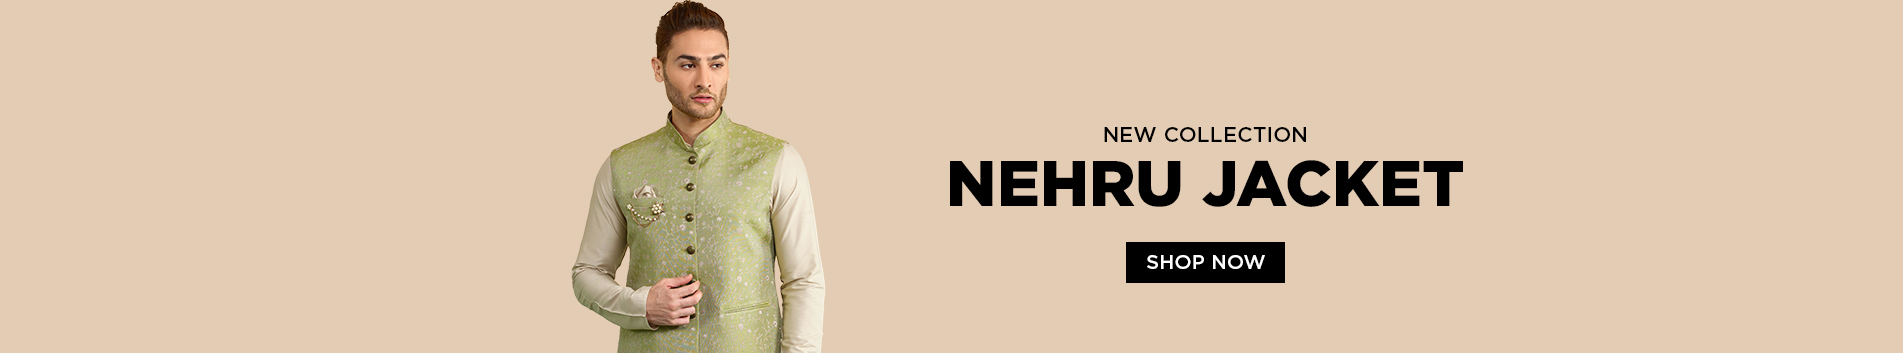 Mens Waistcoat / Nehru Jacket